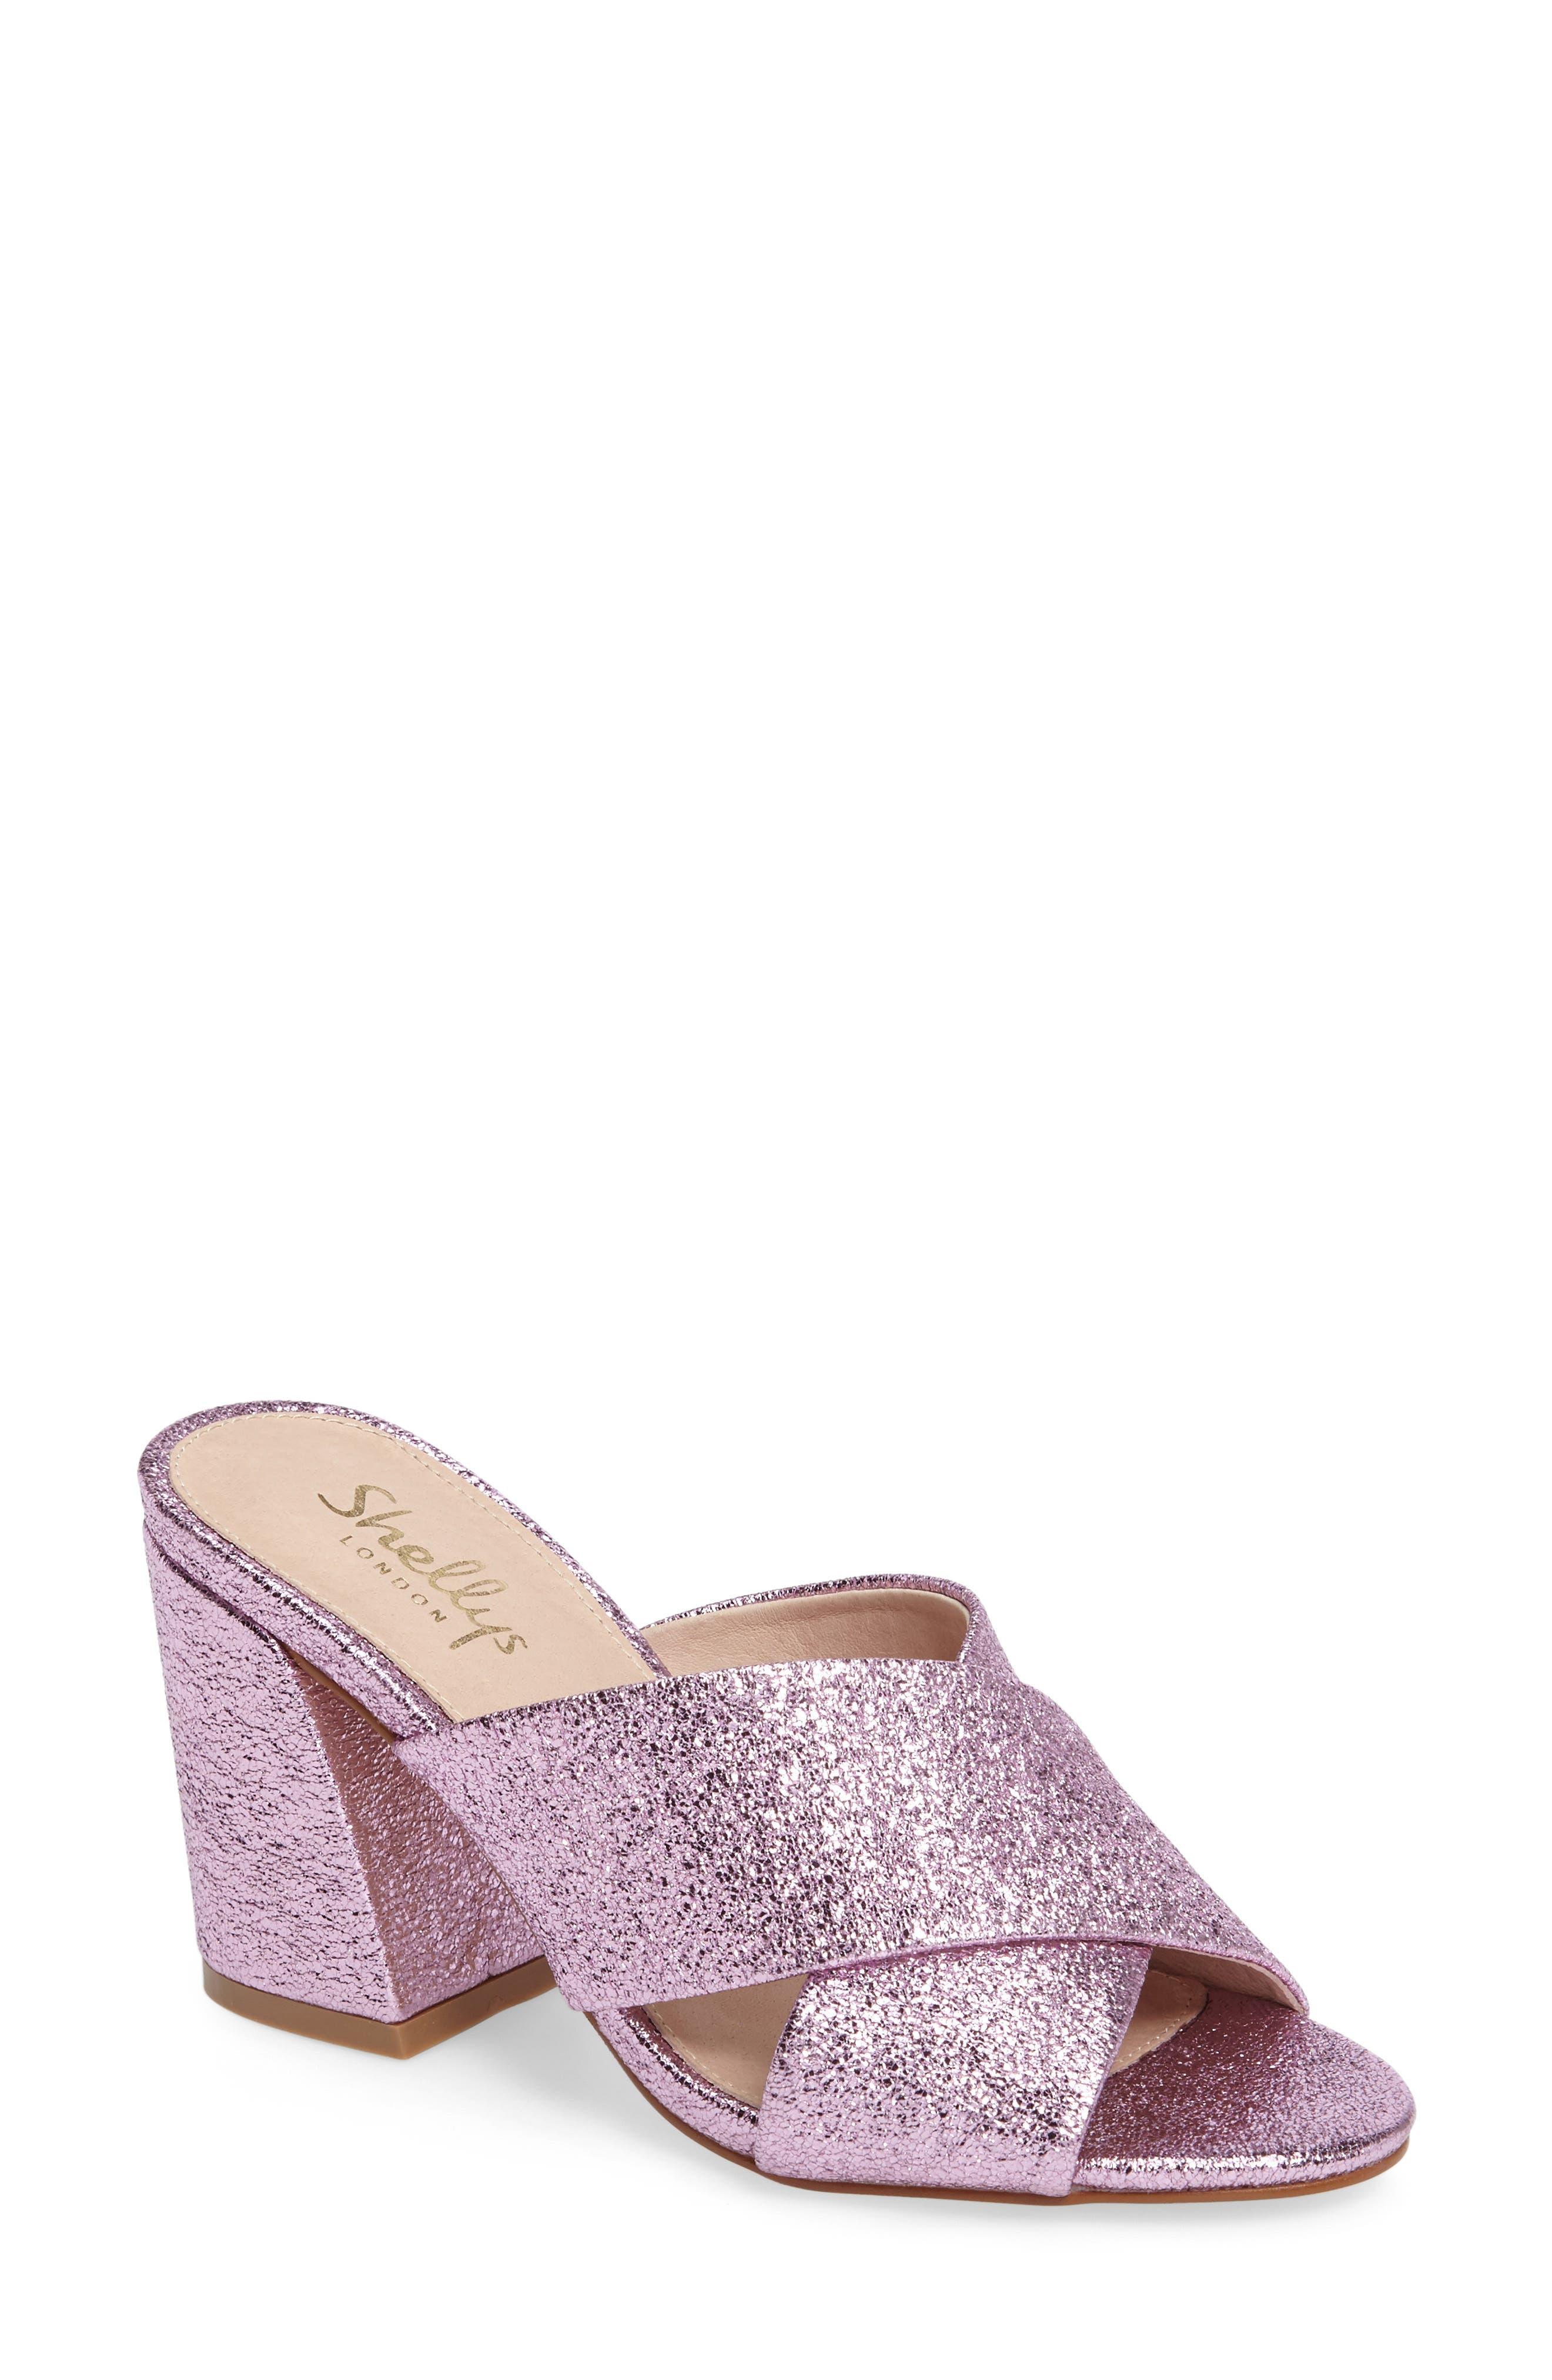 Alternate Image 1 Selected - Shellys London Dani Block Heel Sandal (Women)